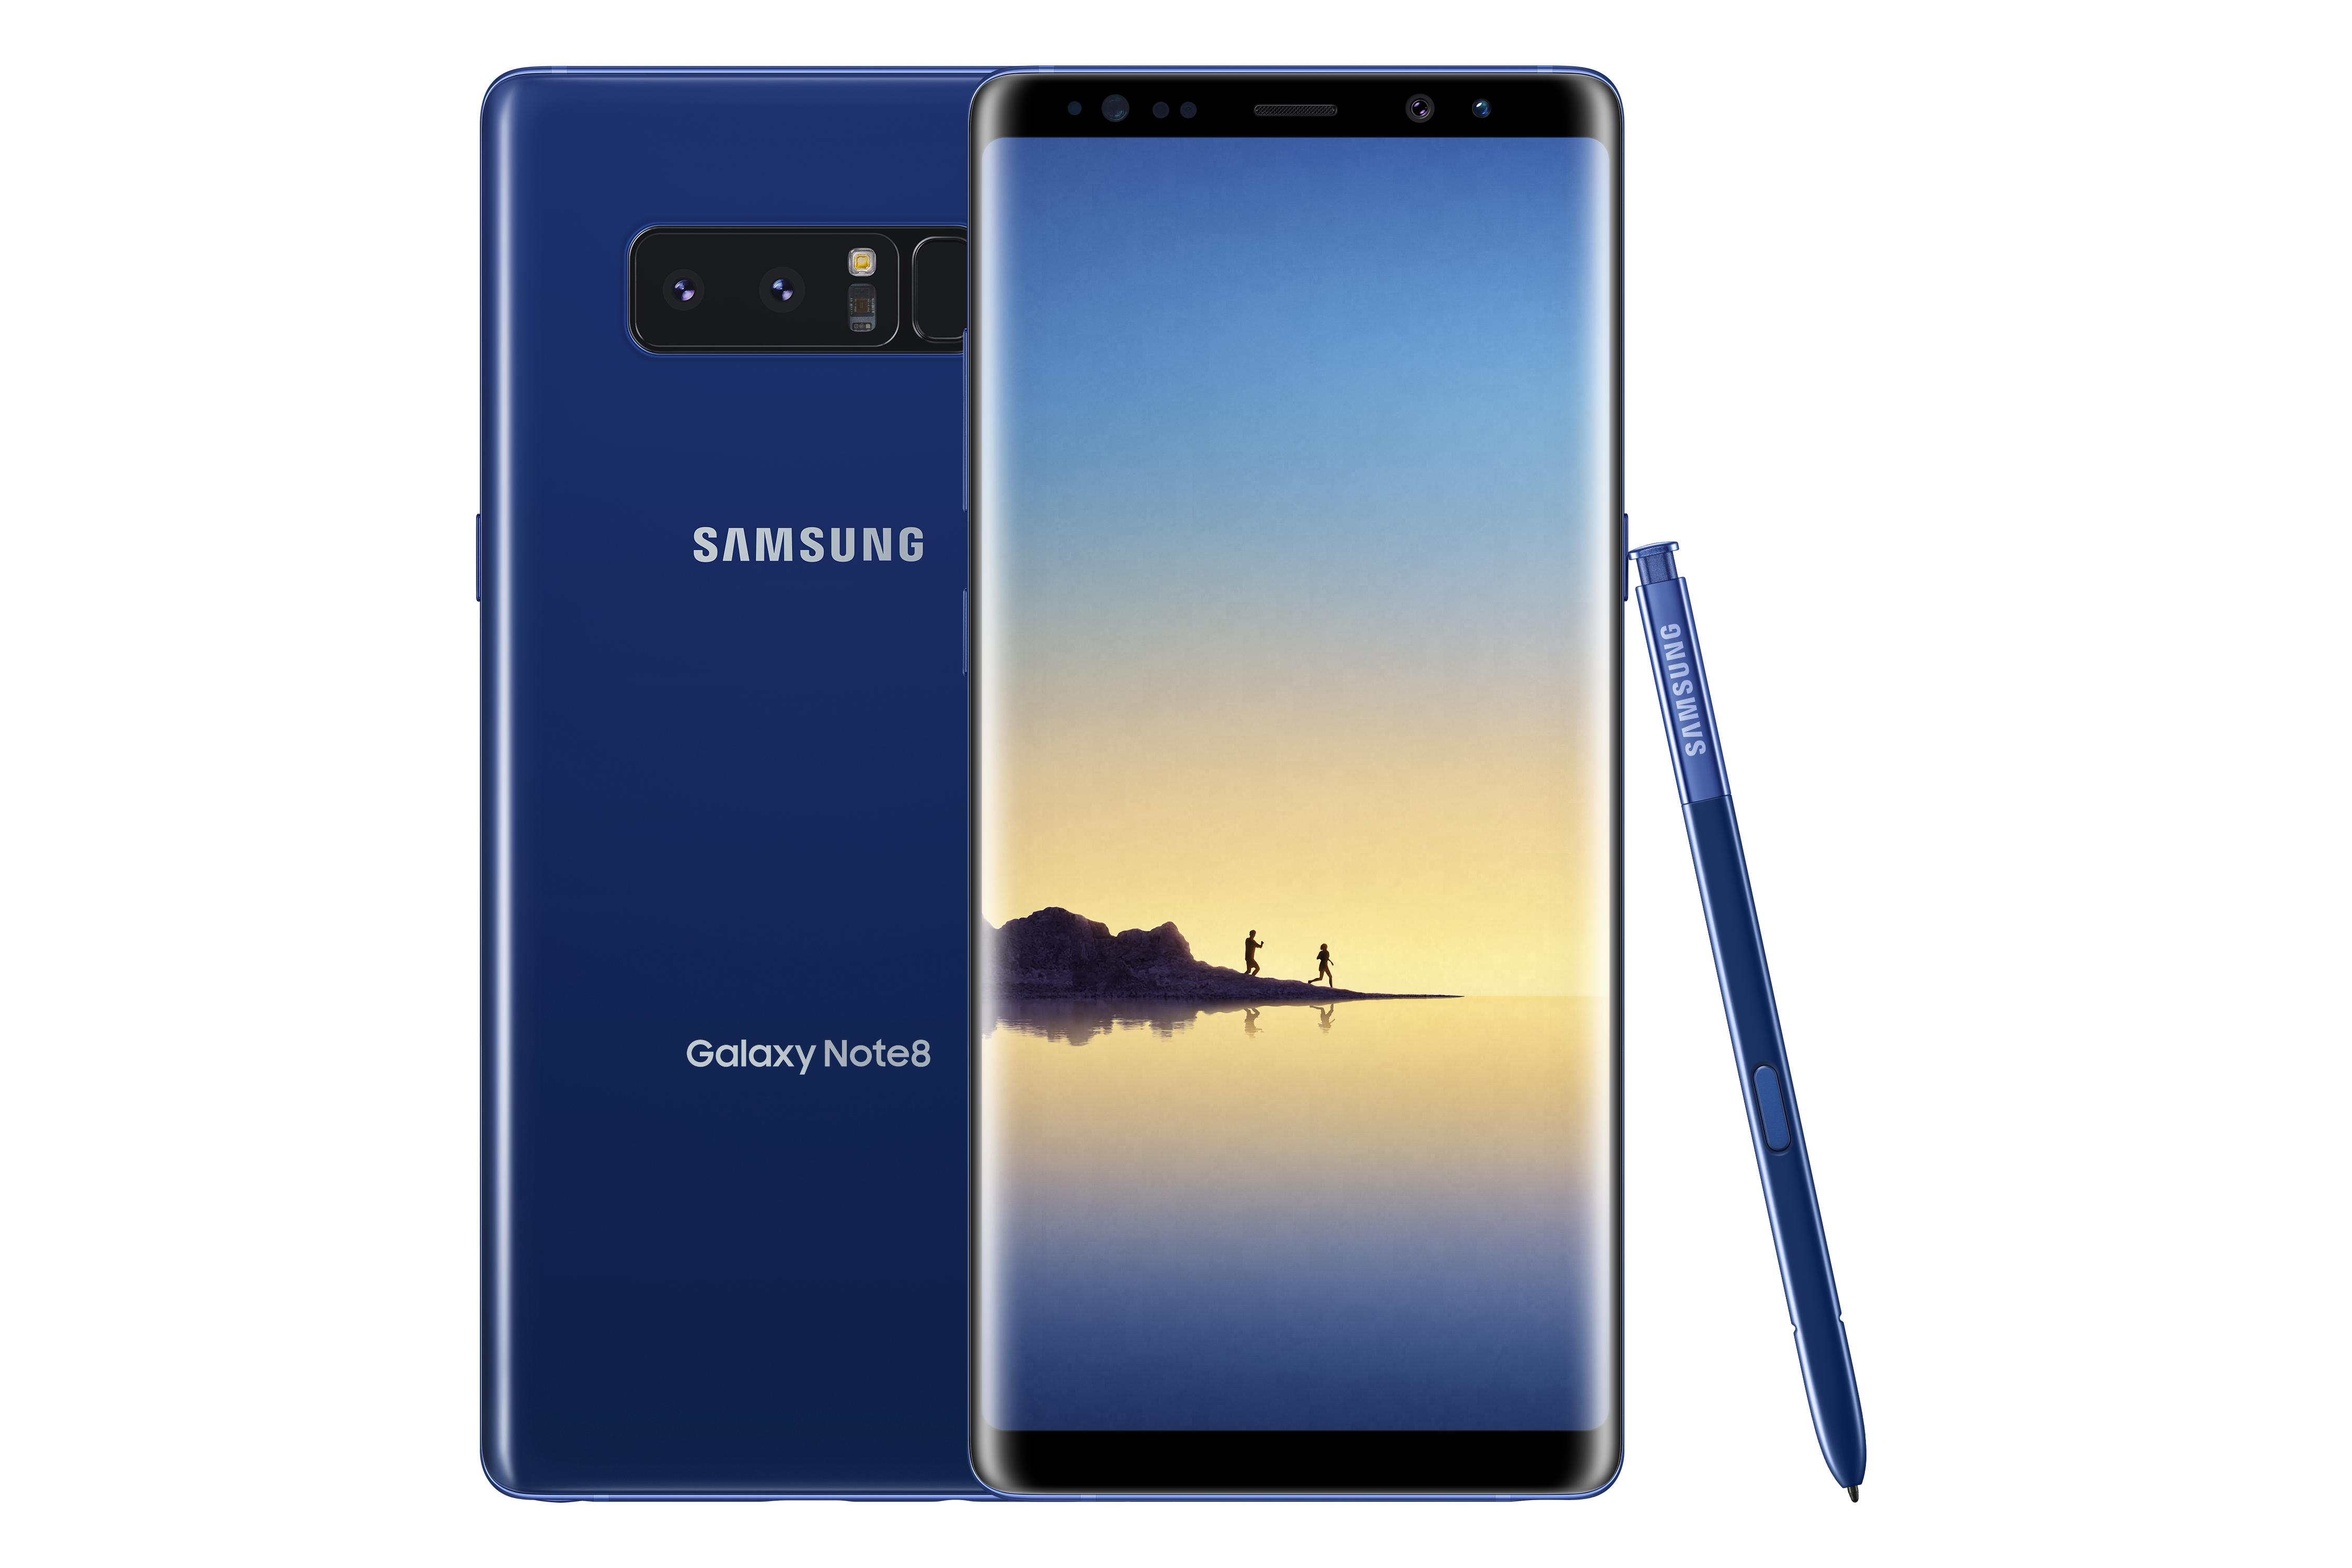 fd63e94ba6dfe3 Samsung adds Deepsea Blue color to Galaxy Note8 Portfolio in the U.S.